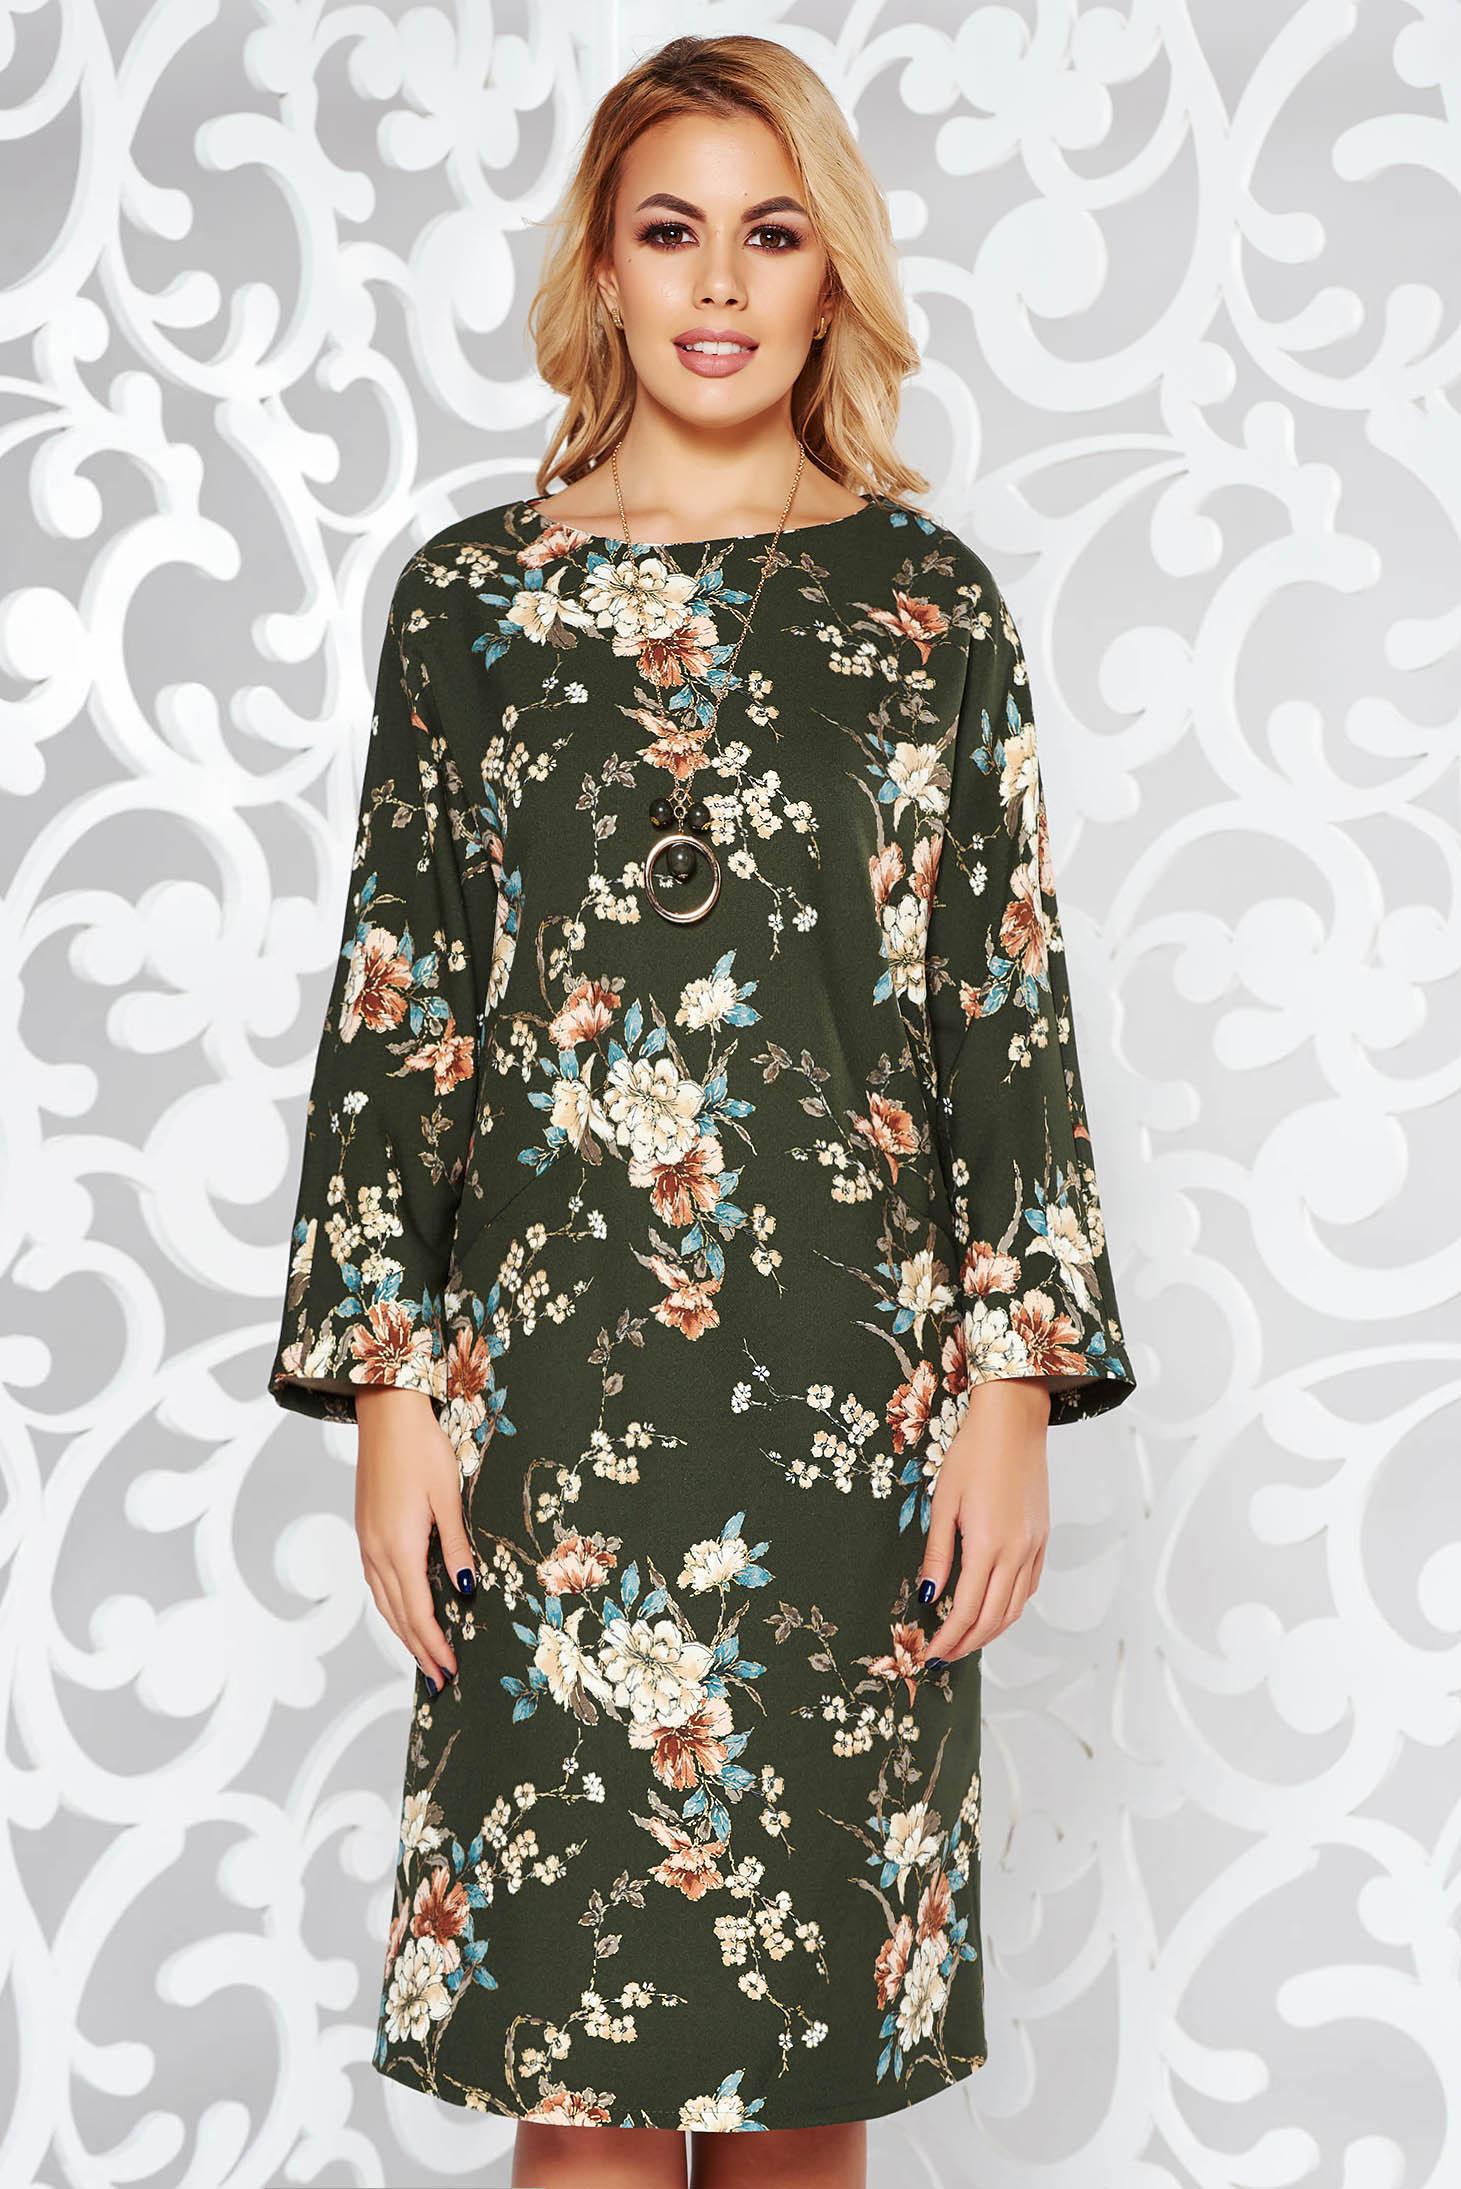 Darkgreen elegant flared dress slightly elastic fabric accessorized with chain